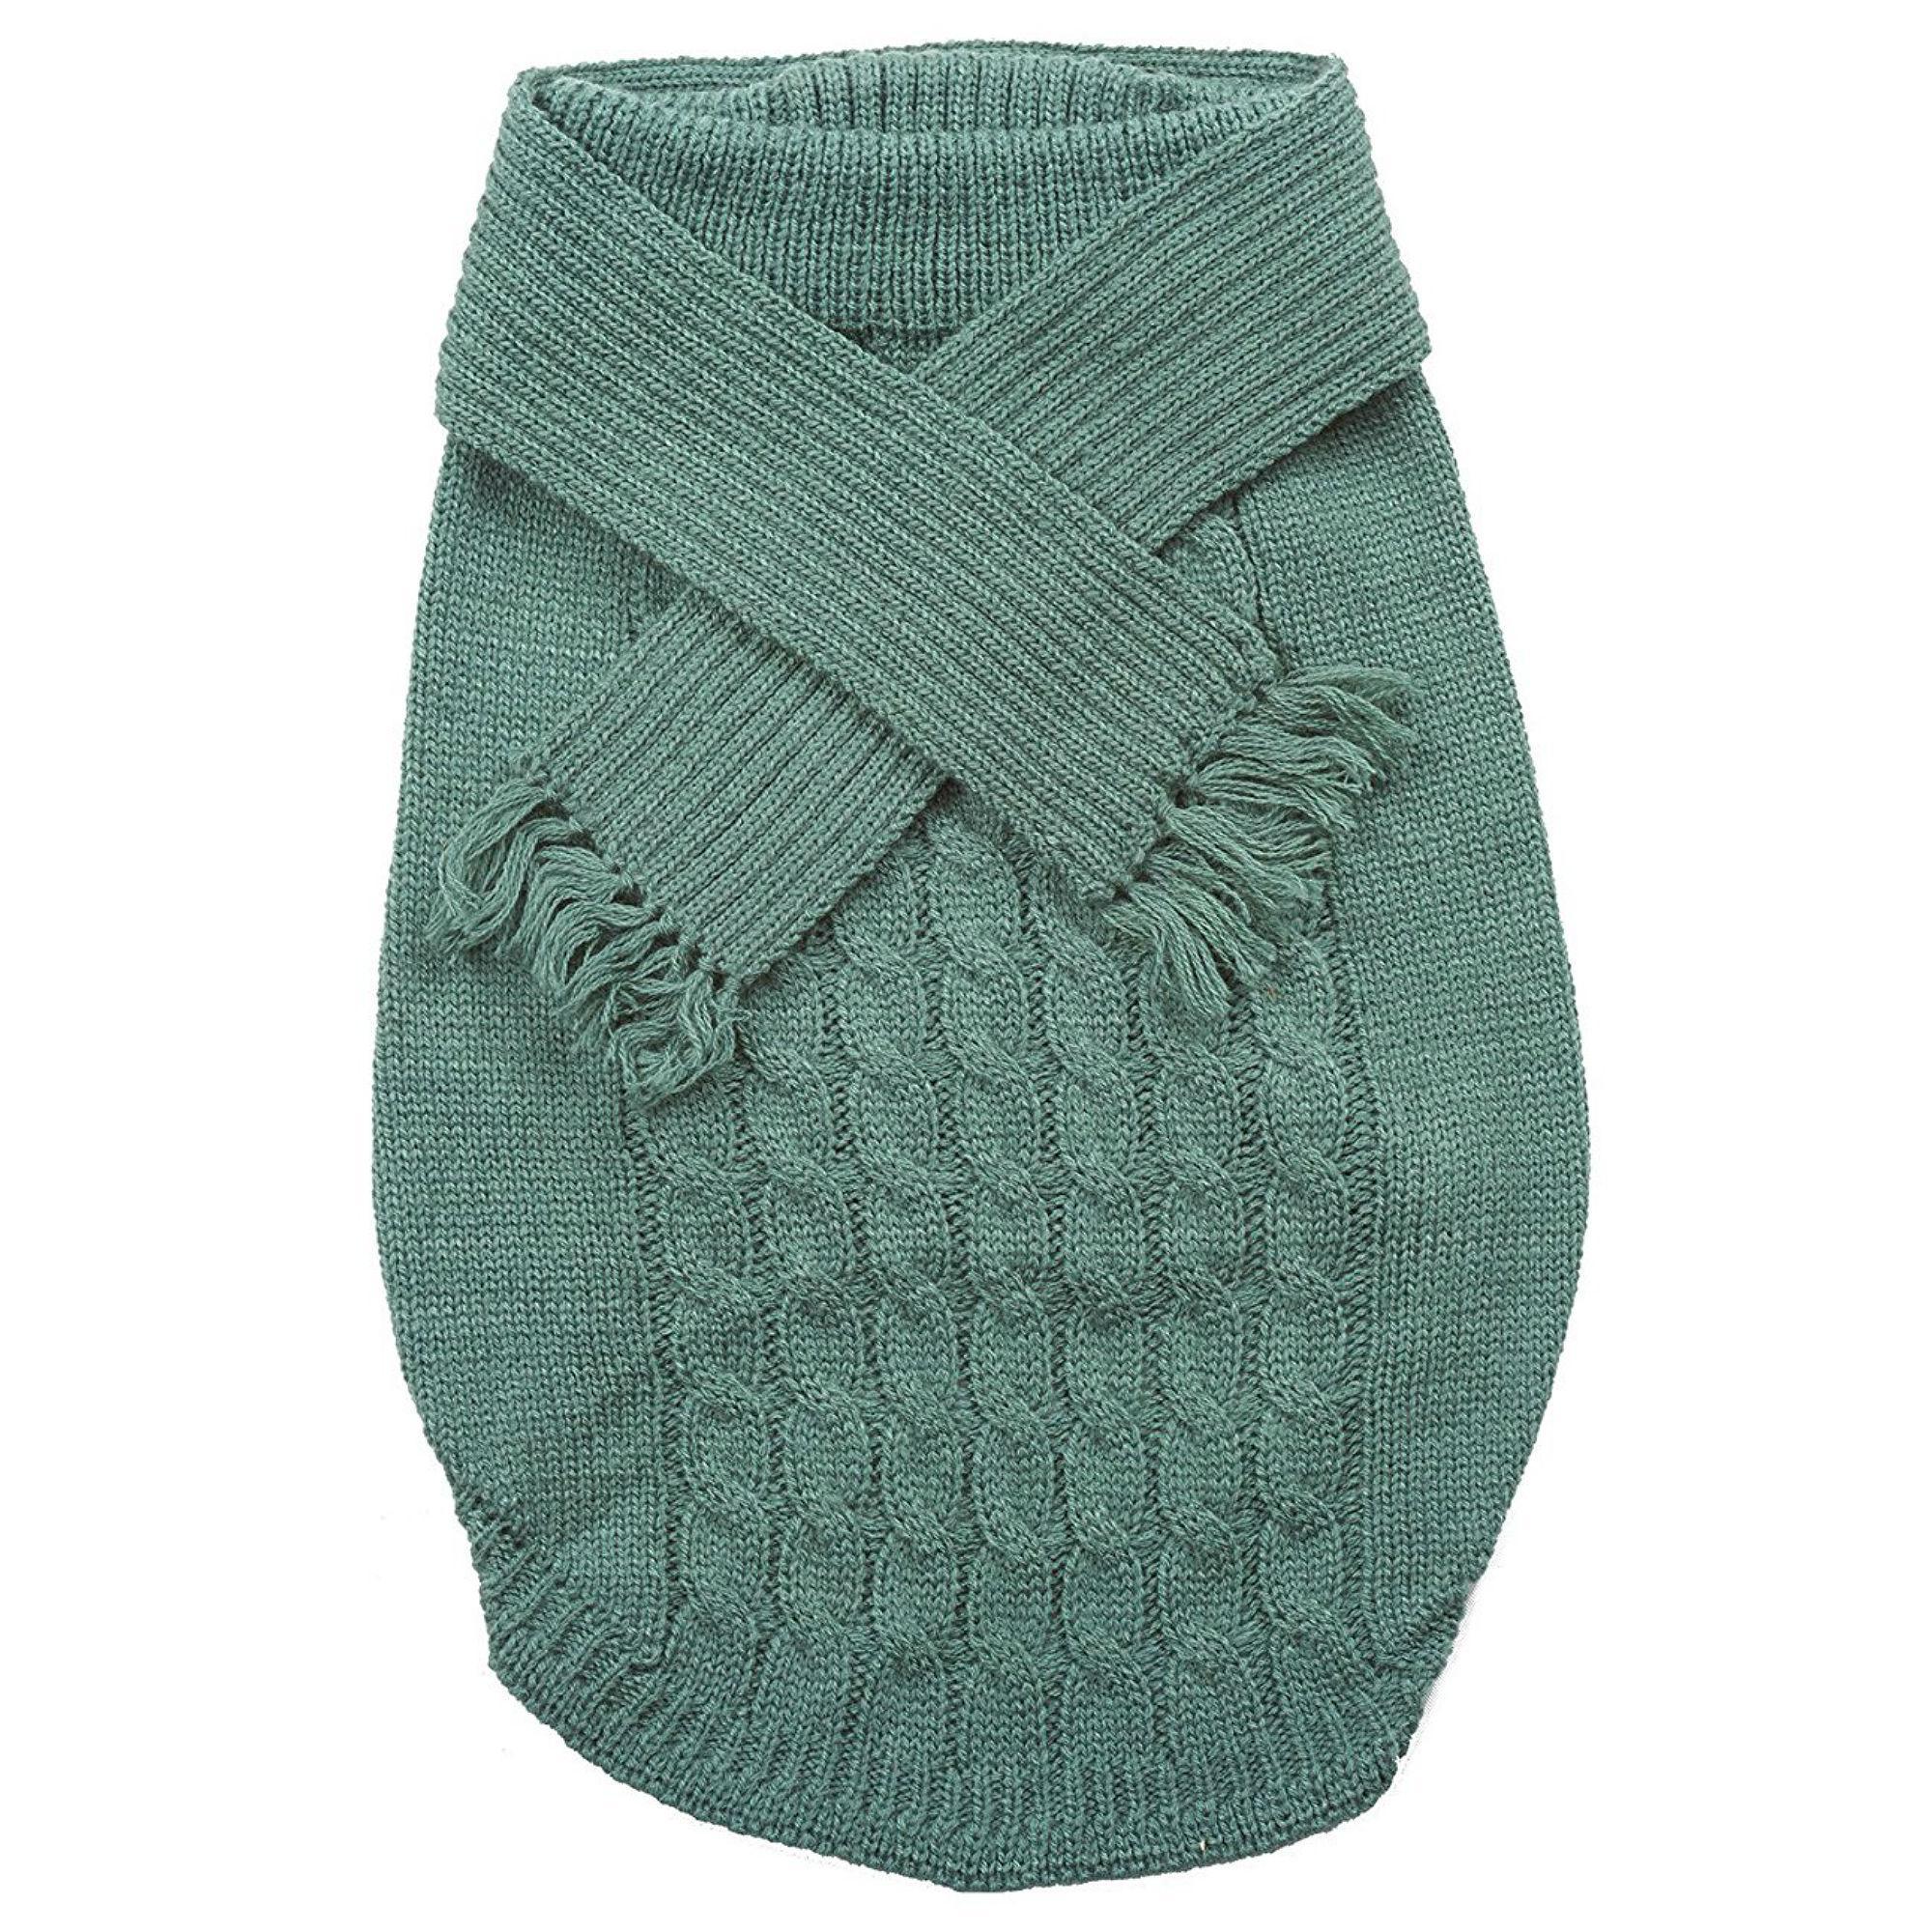 Fashion Pet Scarf Dog Sweater - Sage